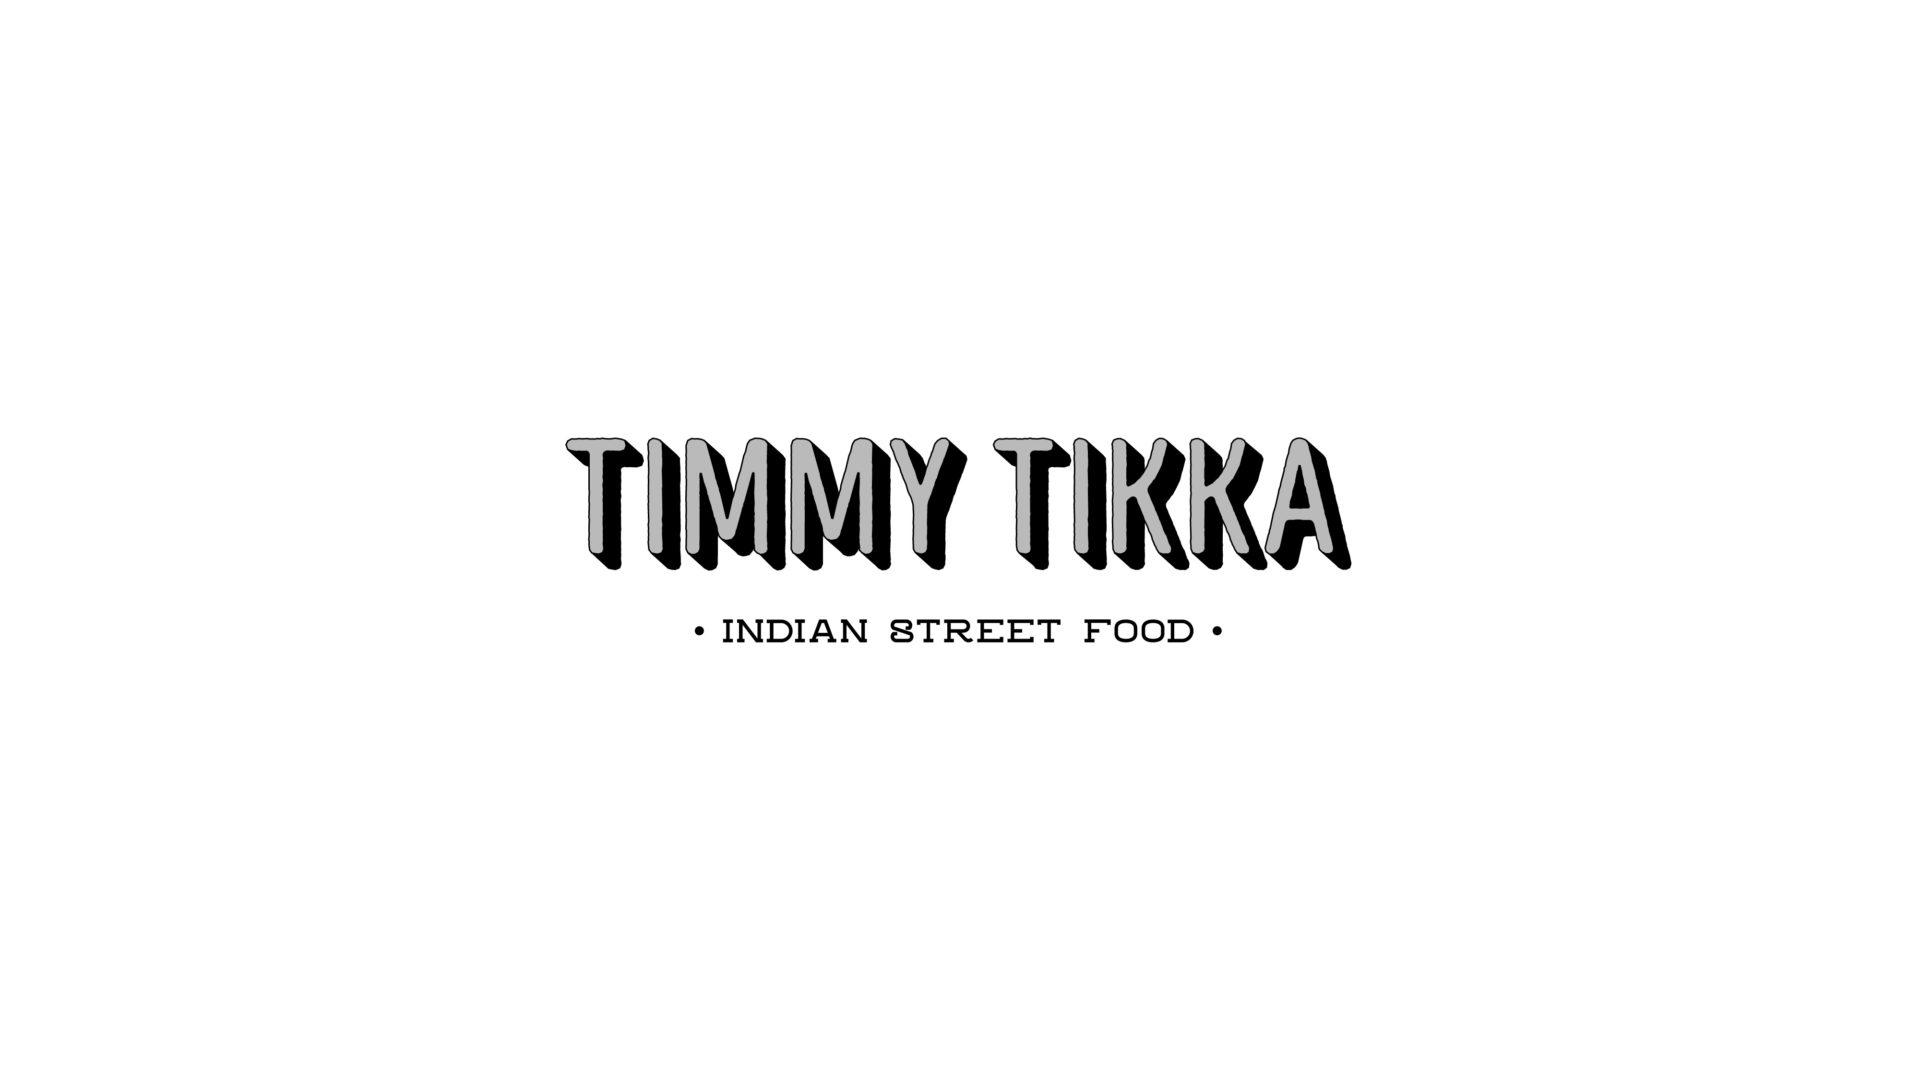 black and white Timmy Tikka logo